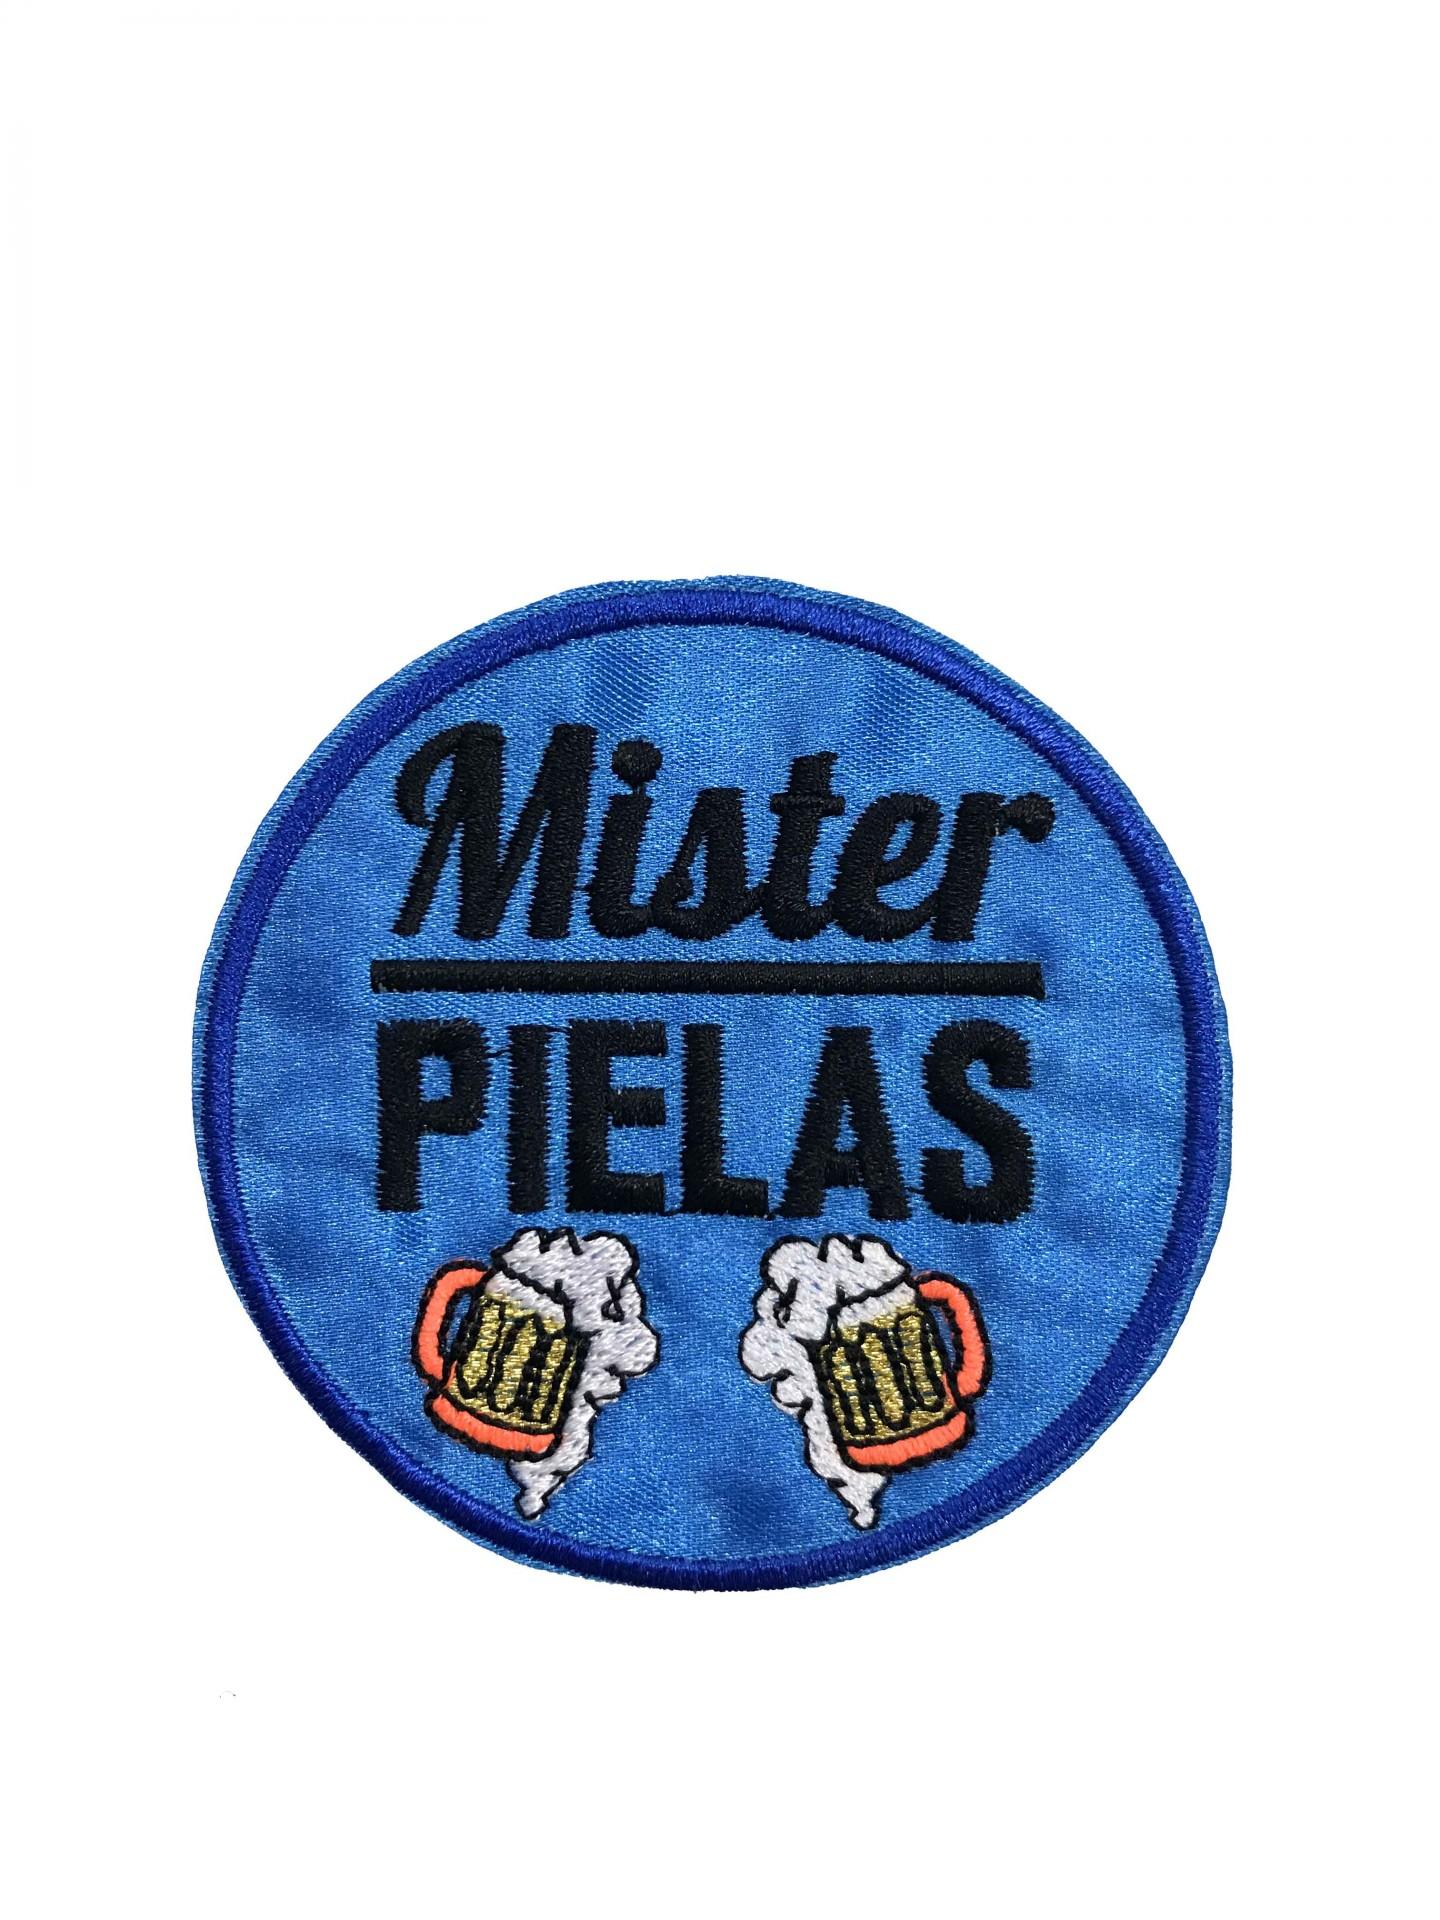 Emblema Mister pielas